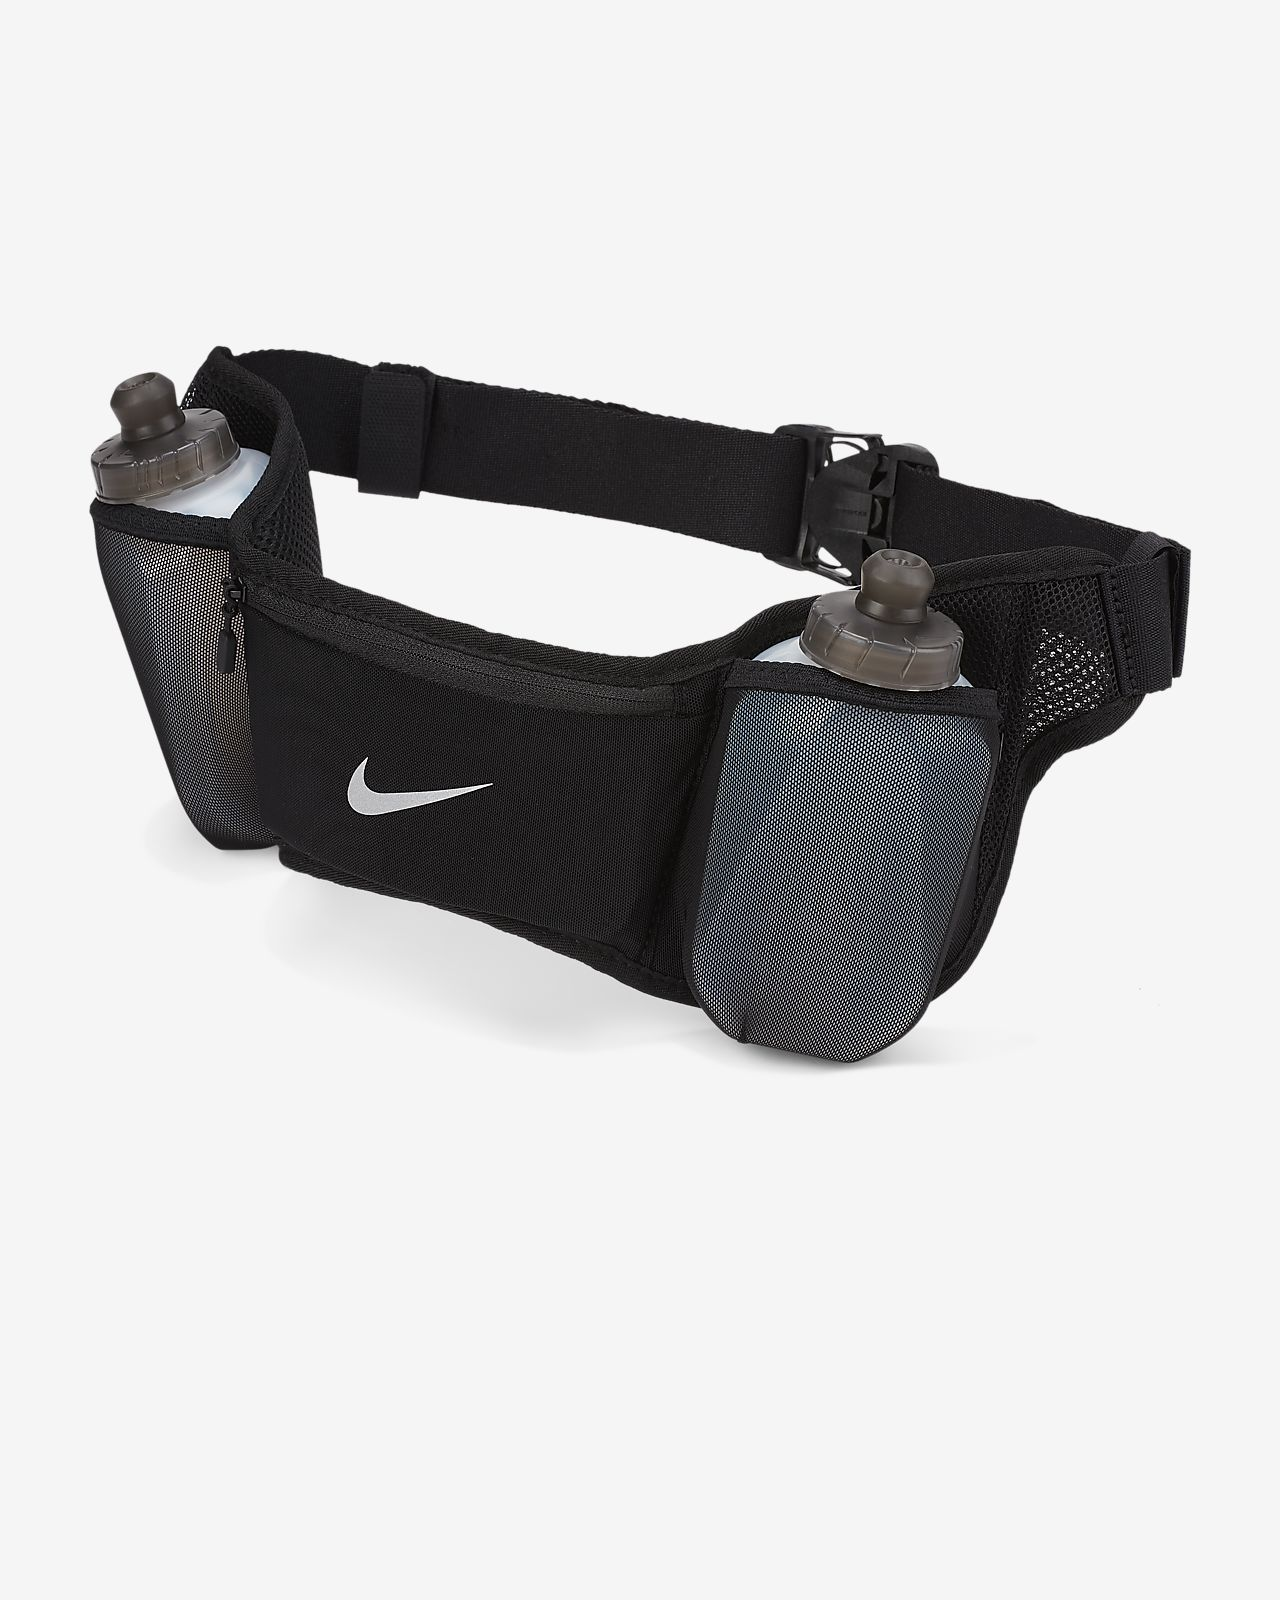 Nike Double Pocket Flask Cinturó